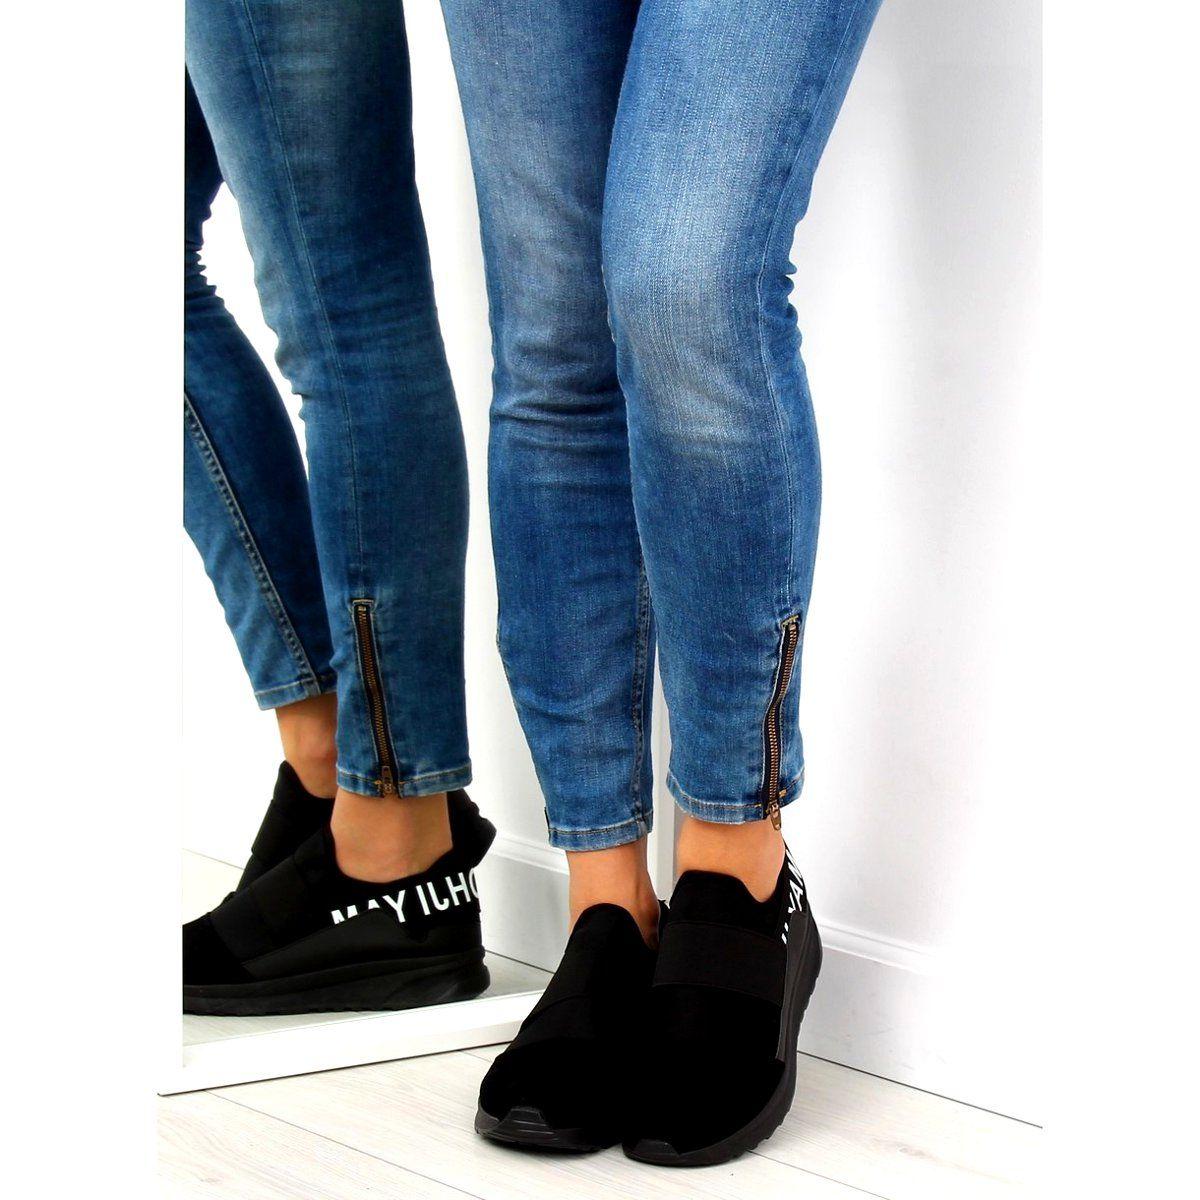 Buty Trekingowe Damskie Szare B1718 9 Grey High Top Sneakers Skinny Jeans Shoes